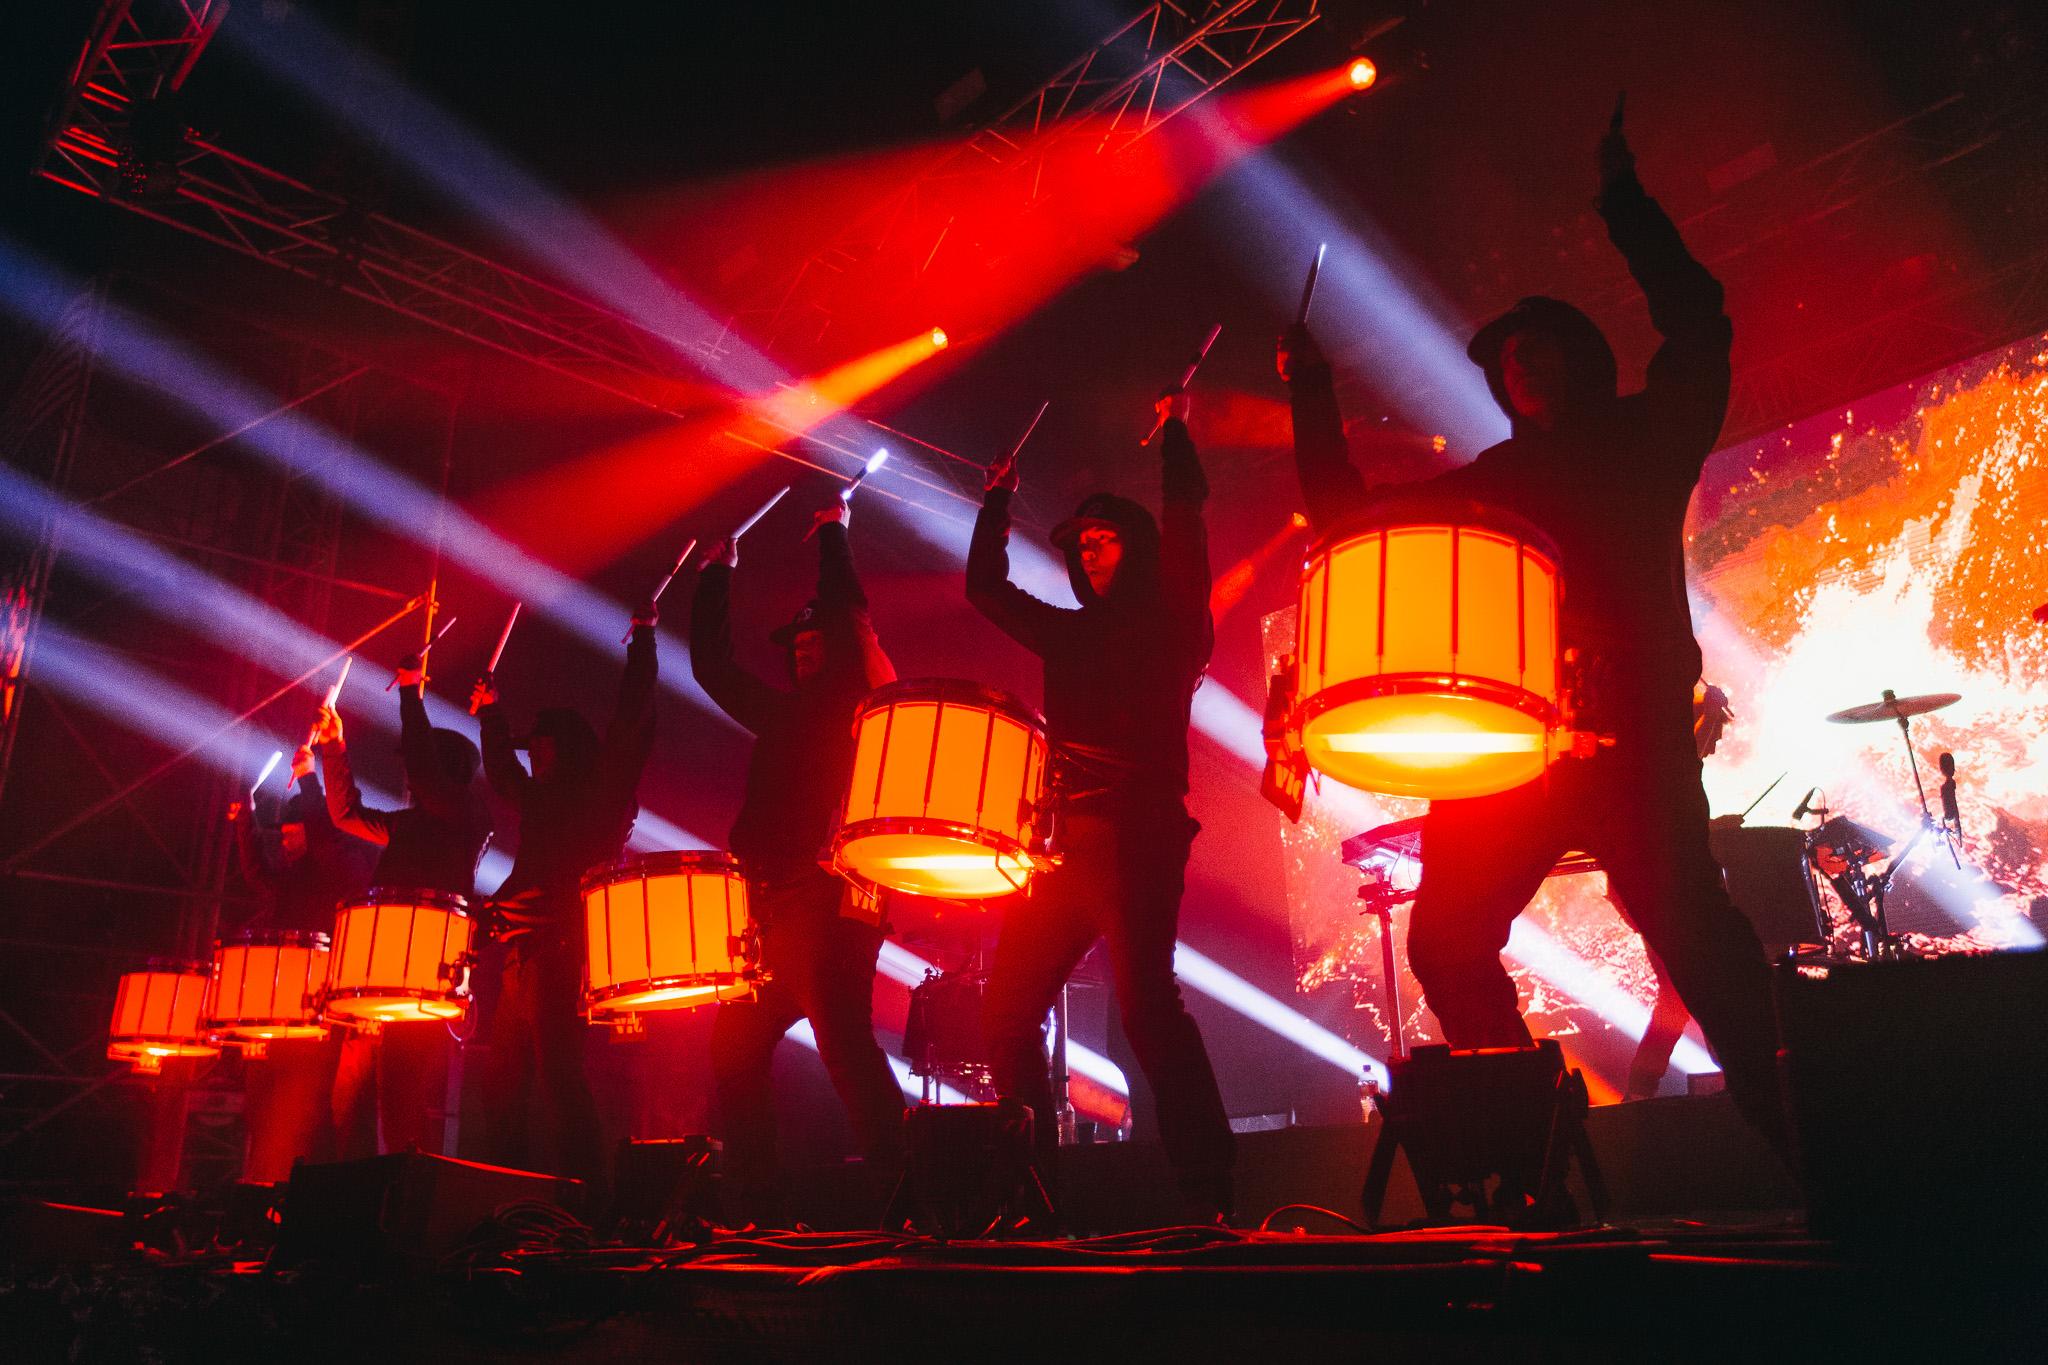 Odesza_Laneway-Festival-Brisbane-2018_Credit-Bianca-Holderness-8.jpg